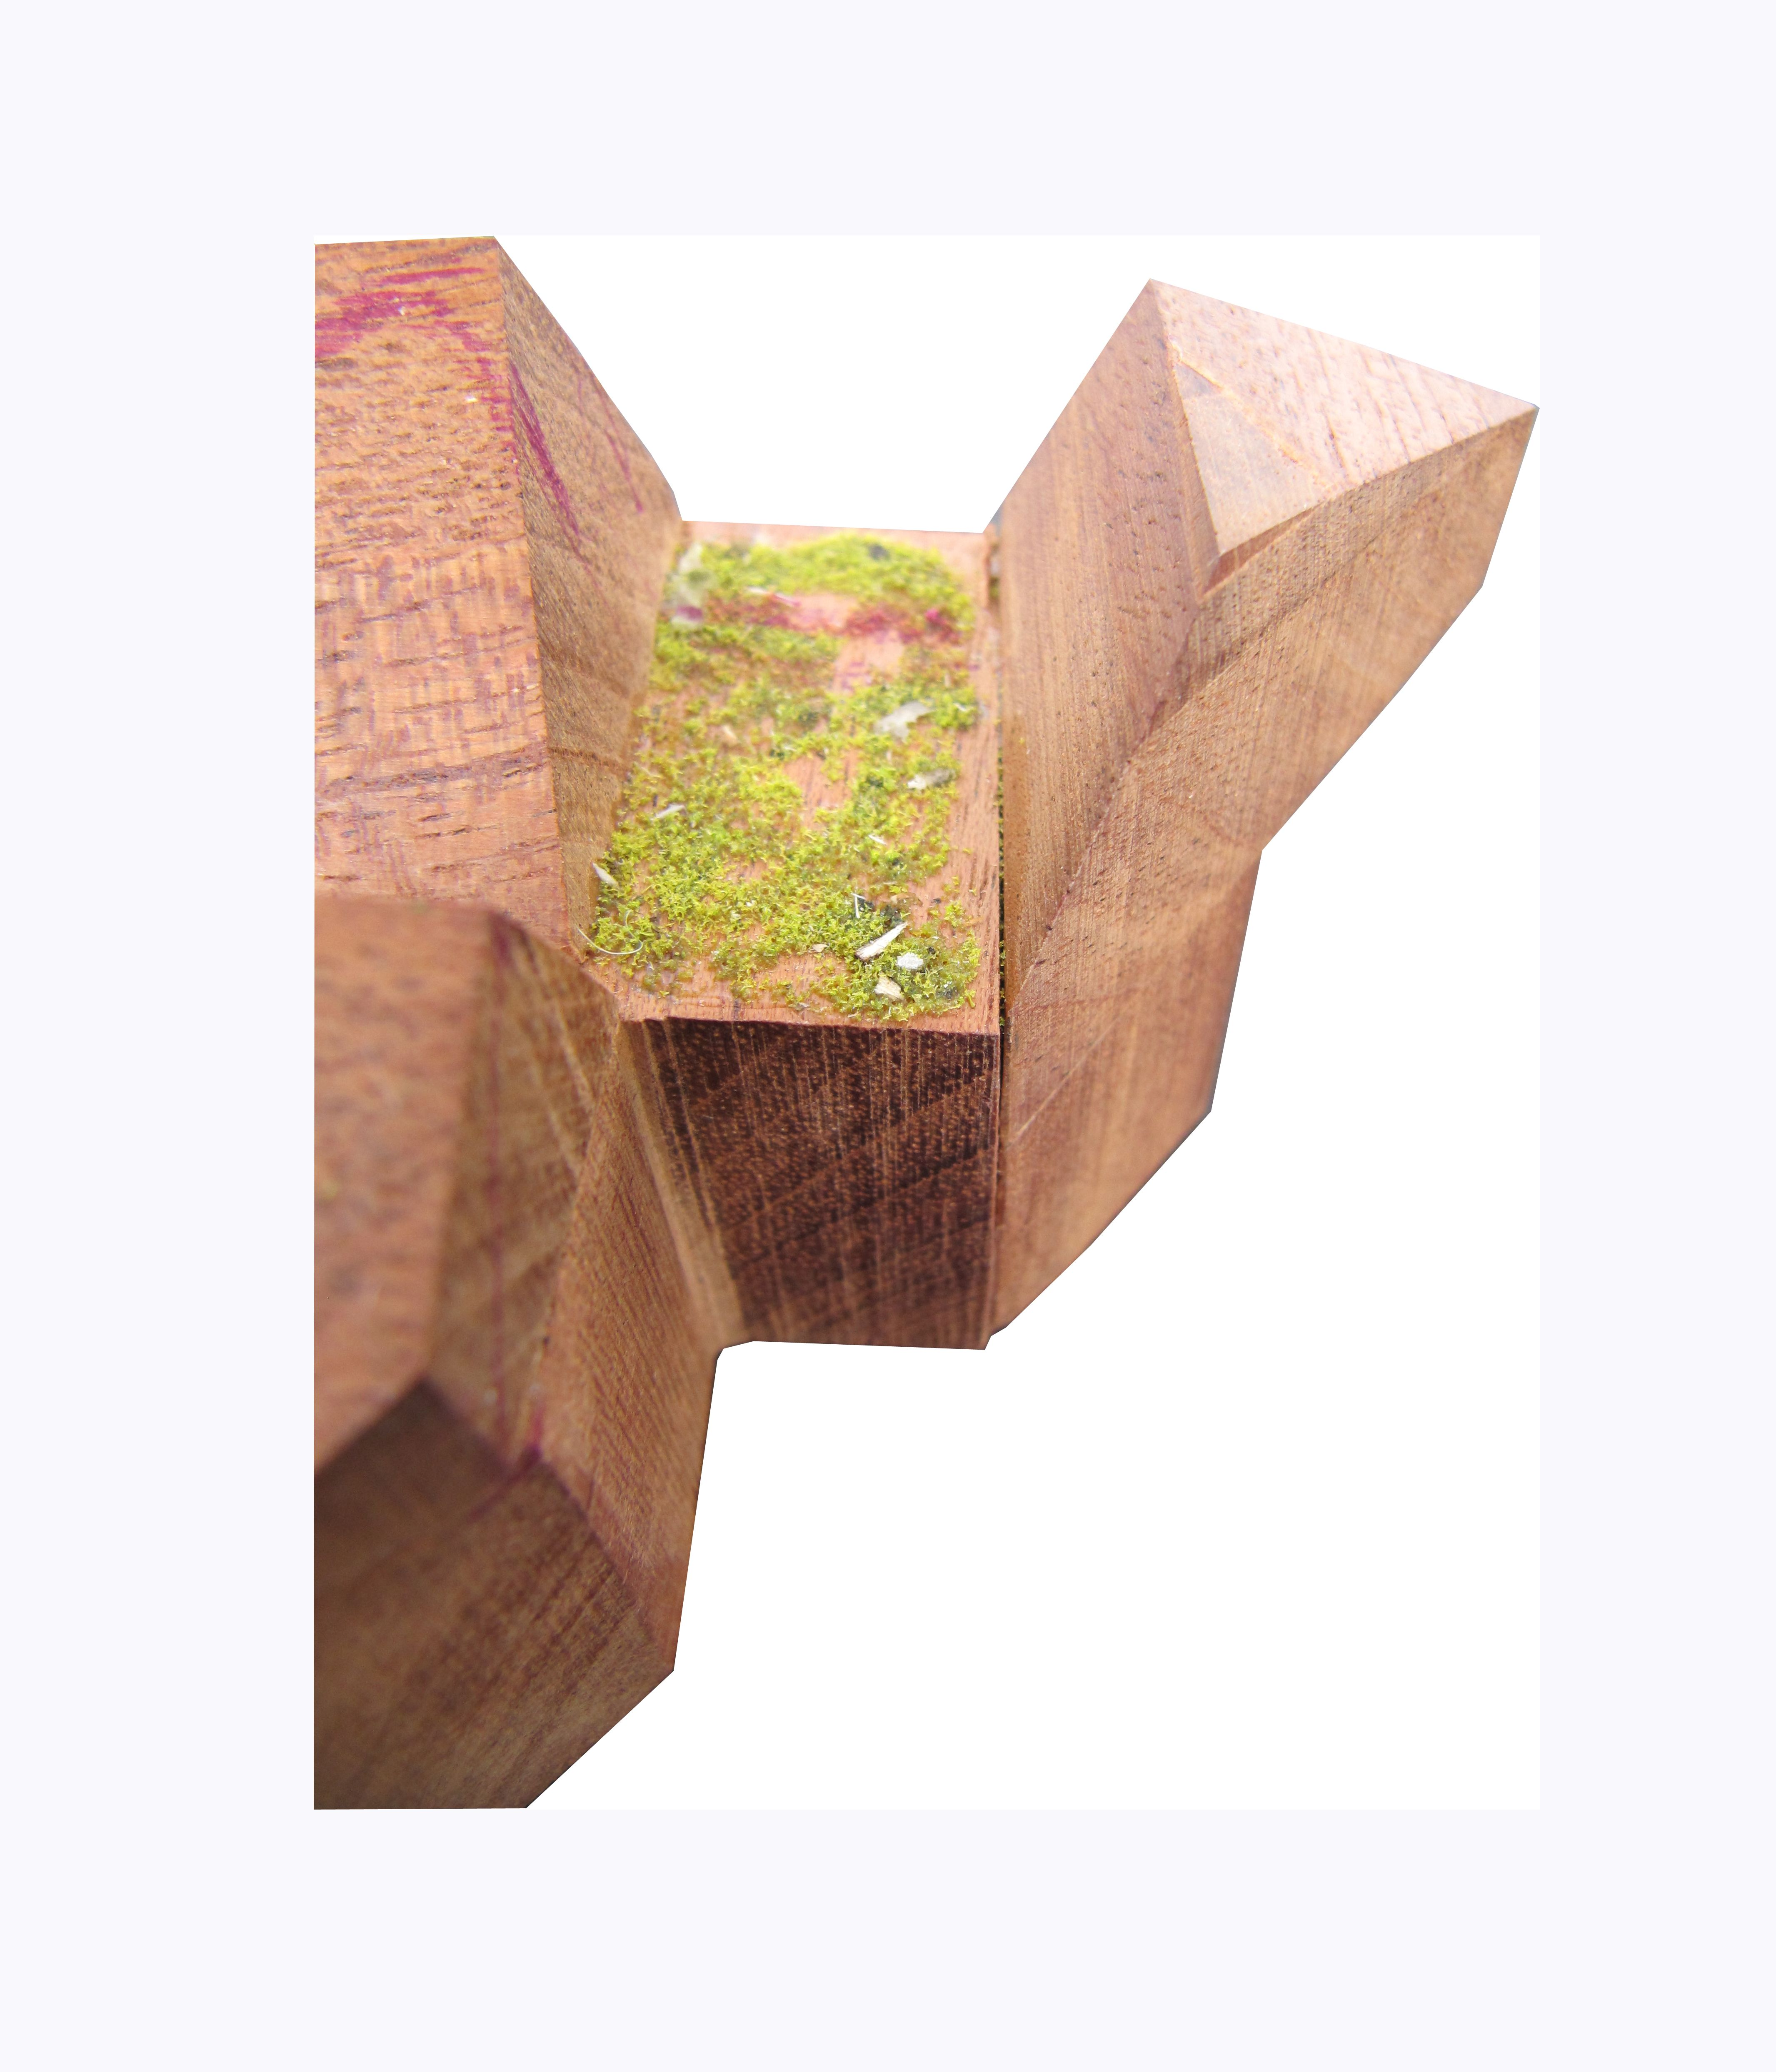 concept model for house for a writer / atelierjones